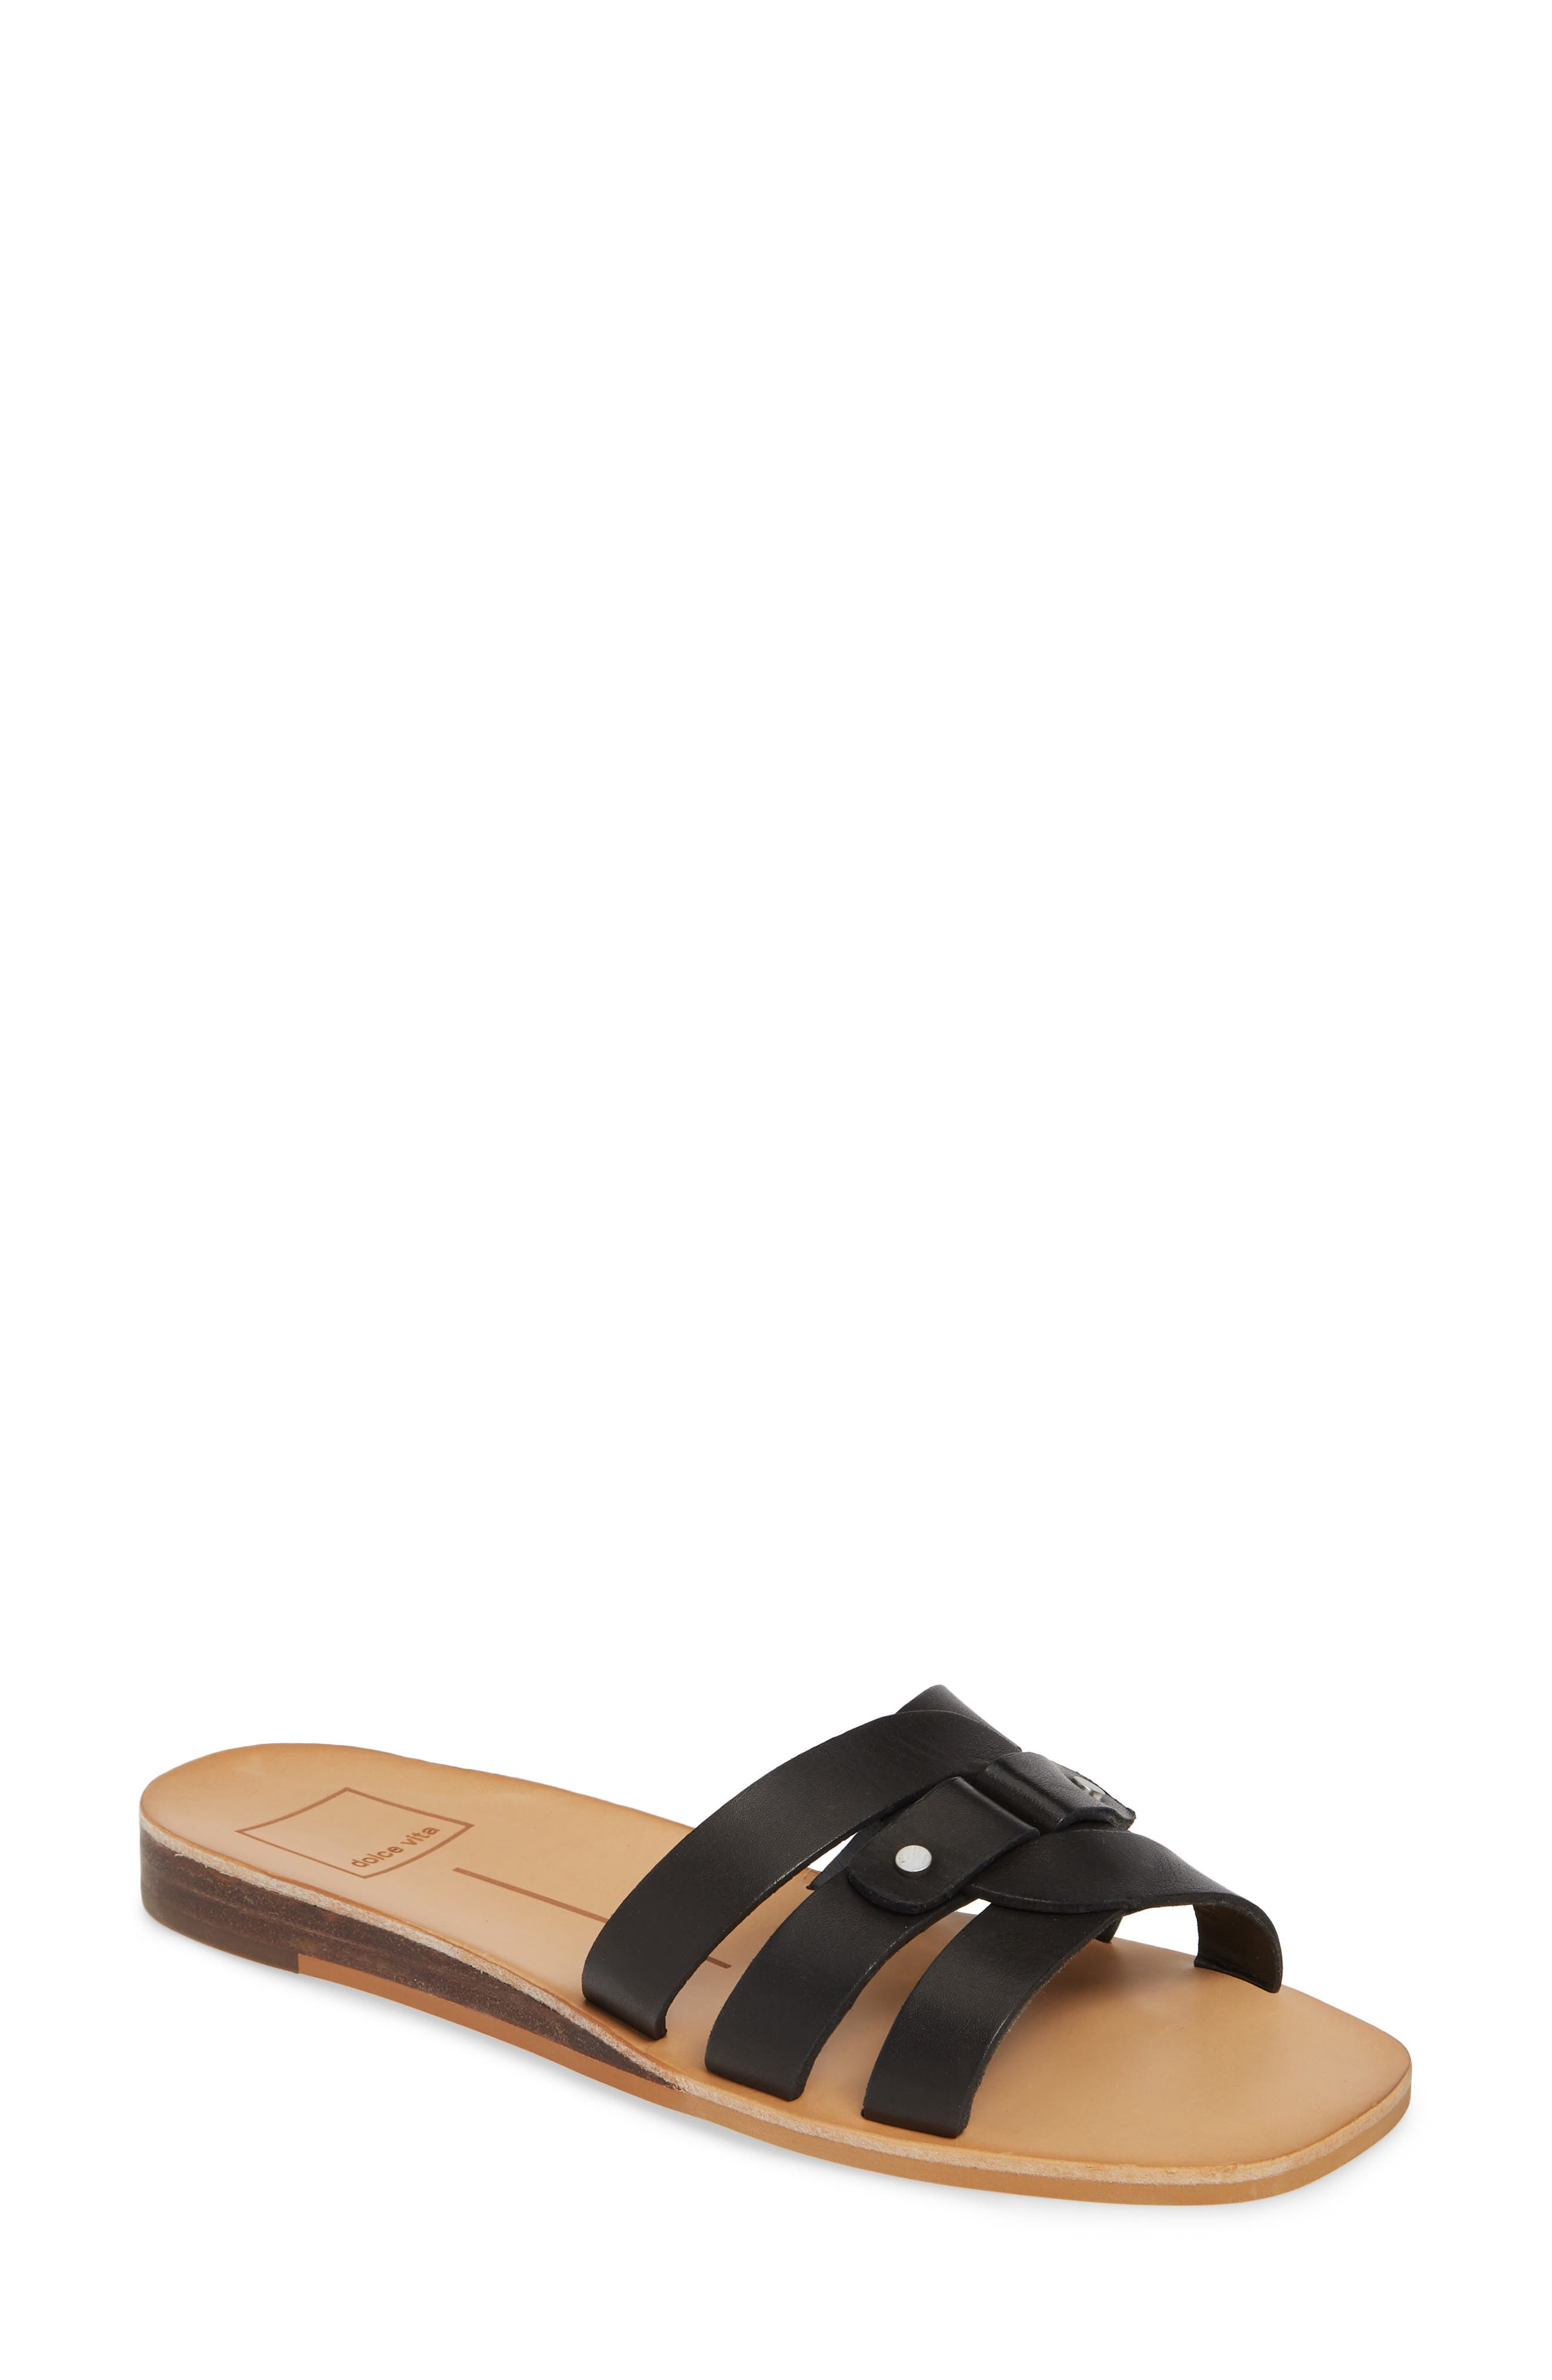 Cait Slide Sandal, Main, color, BLACK LEATHER